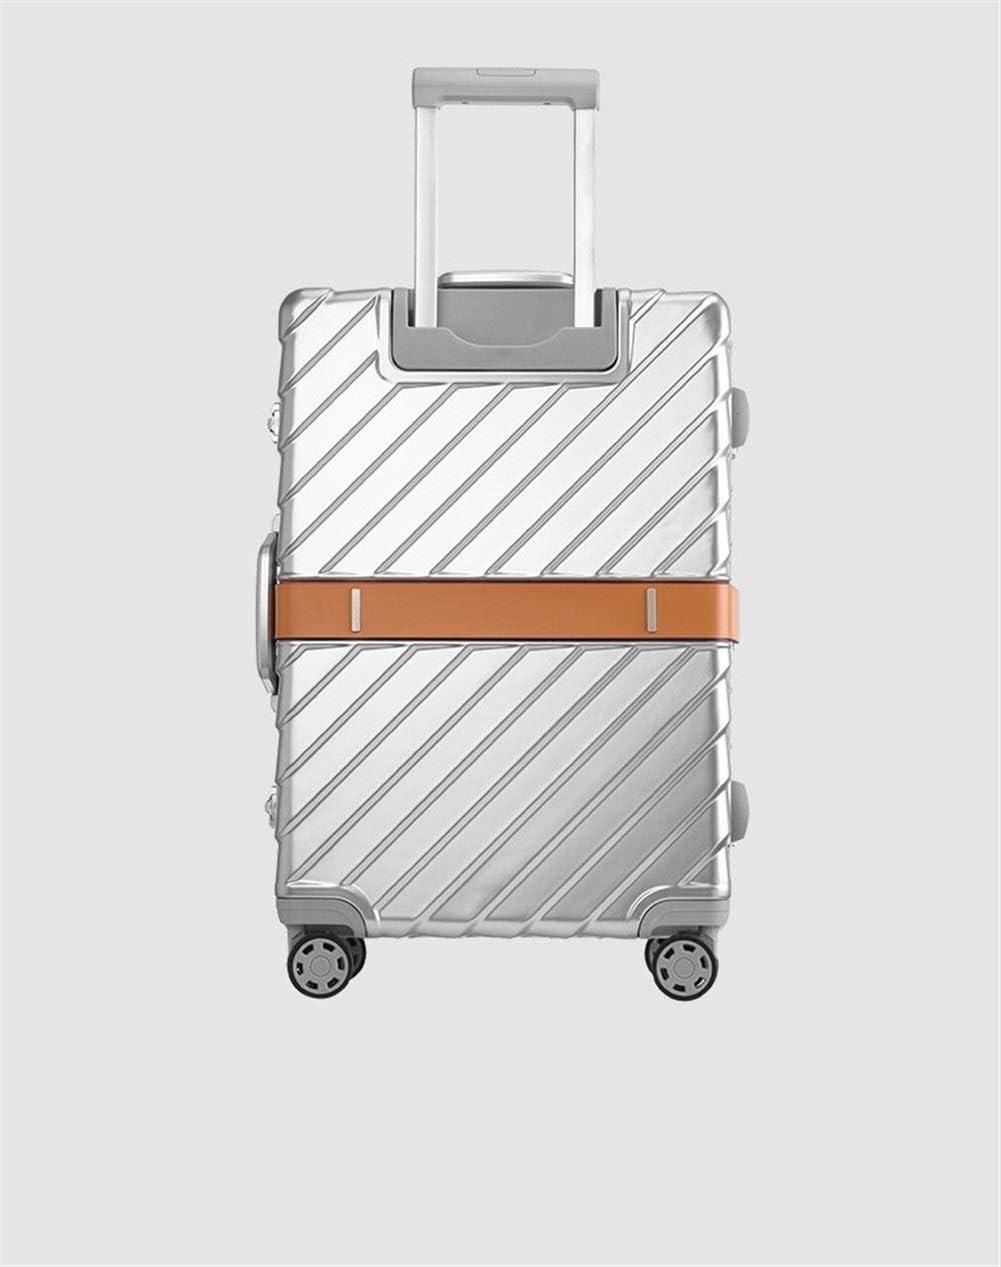 WZC Maleta 20/24/29 pulgadas Tamaño Pc Marco de aluminio Equipaje rodante Super Moda Alta calidad, lujo,No1,20 '